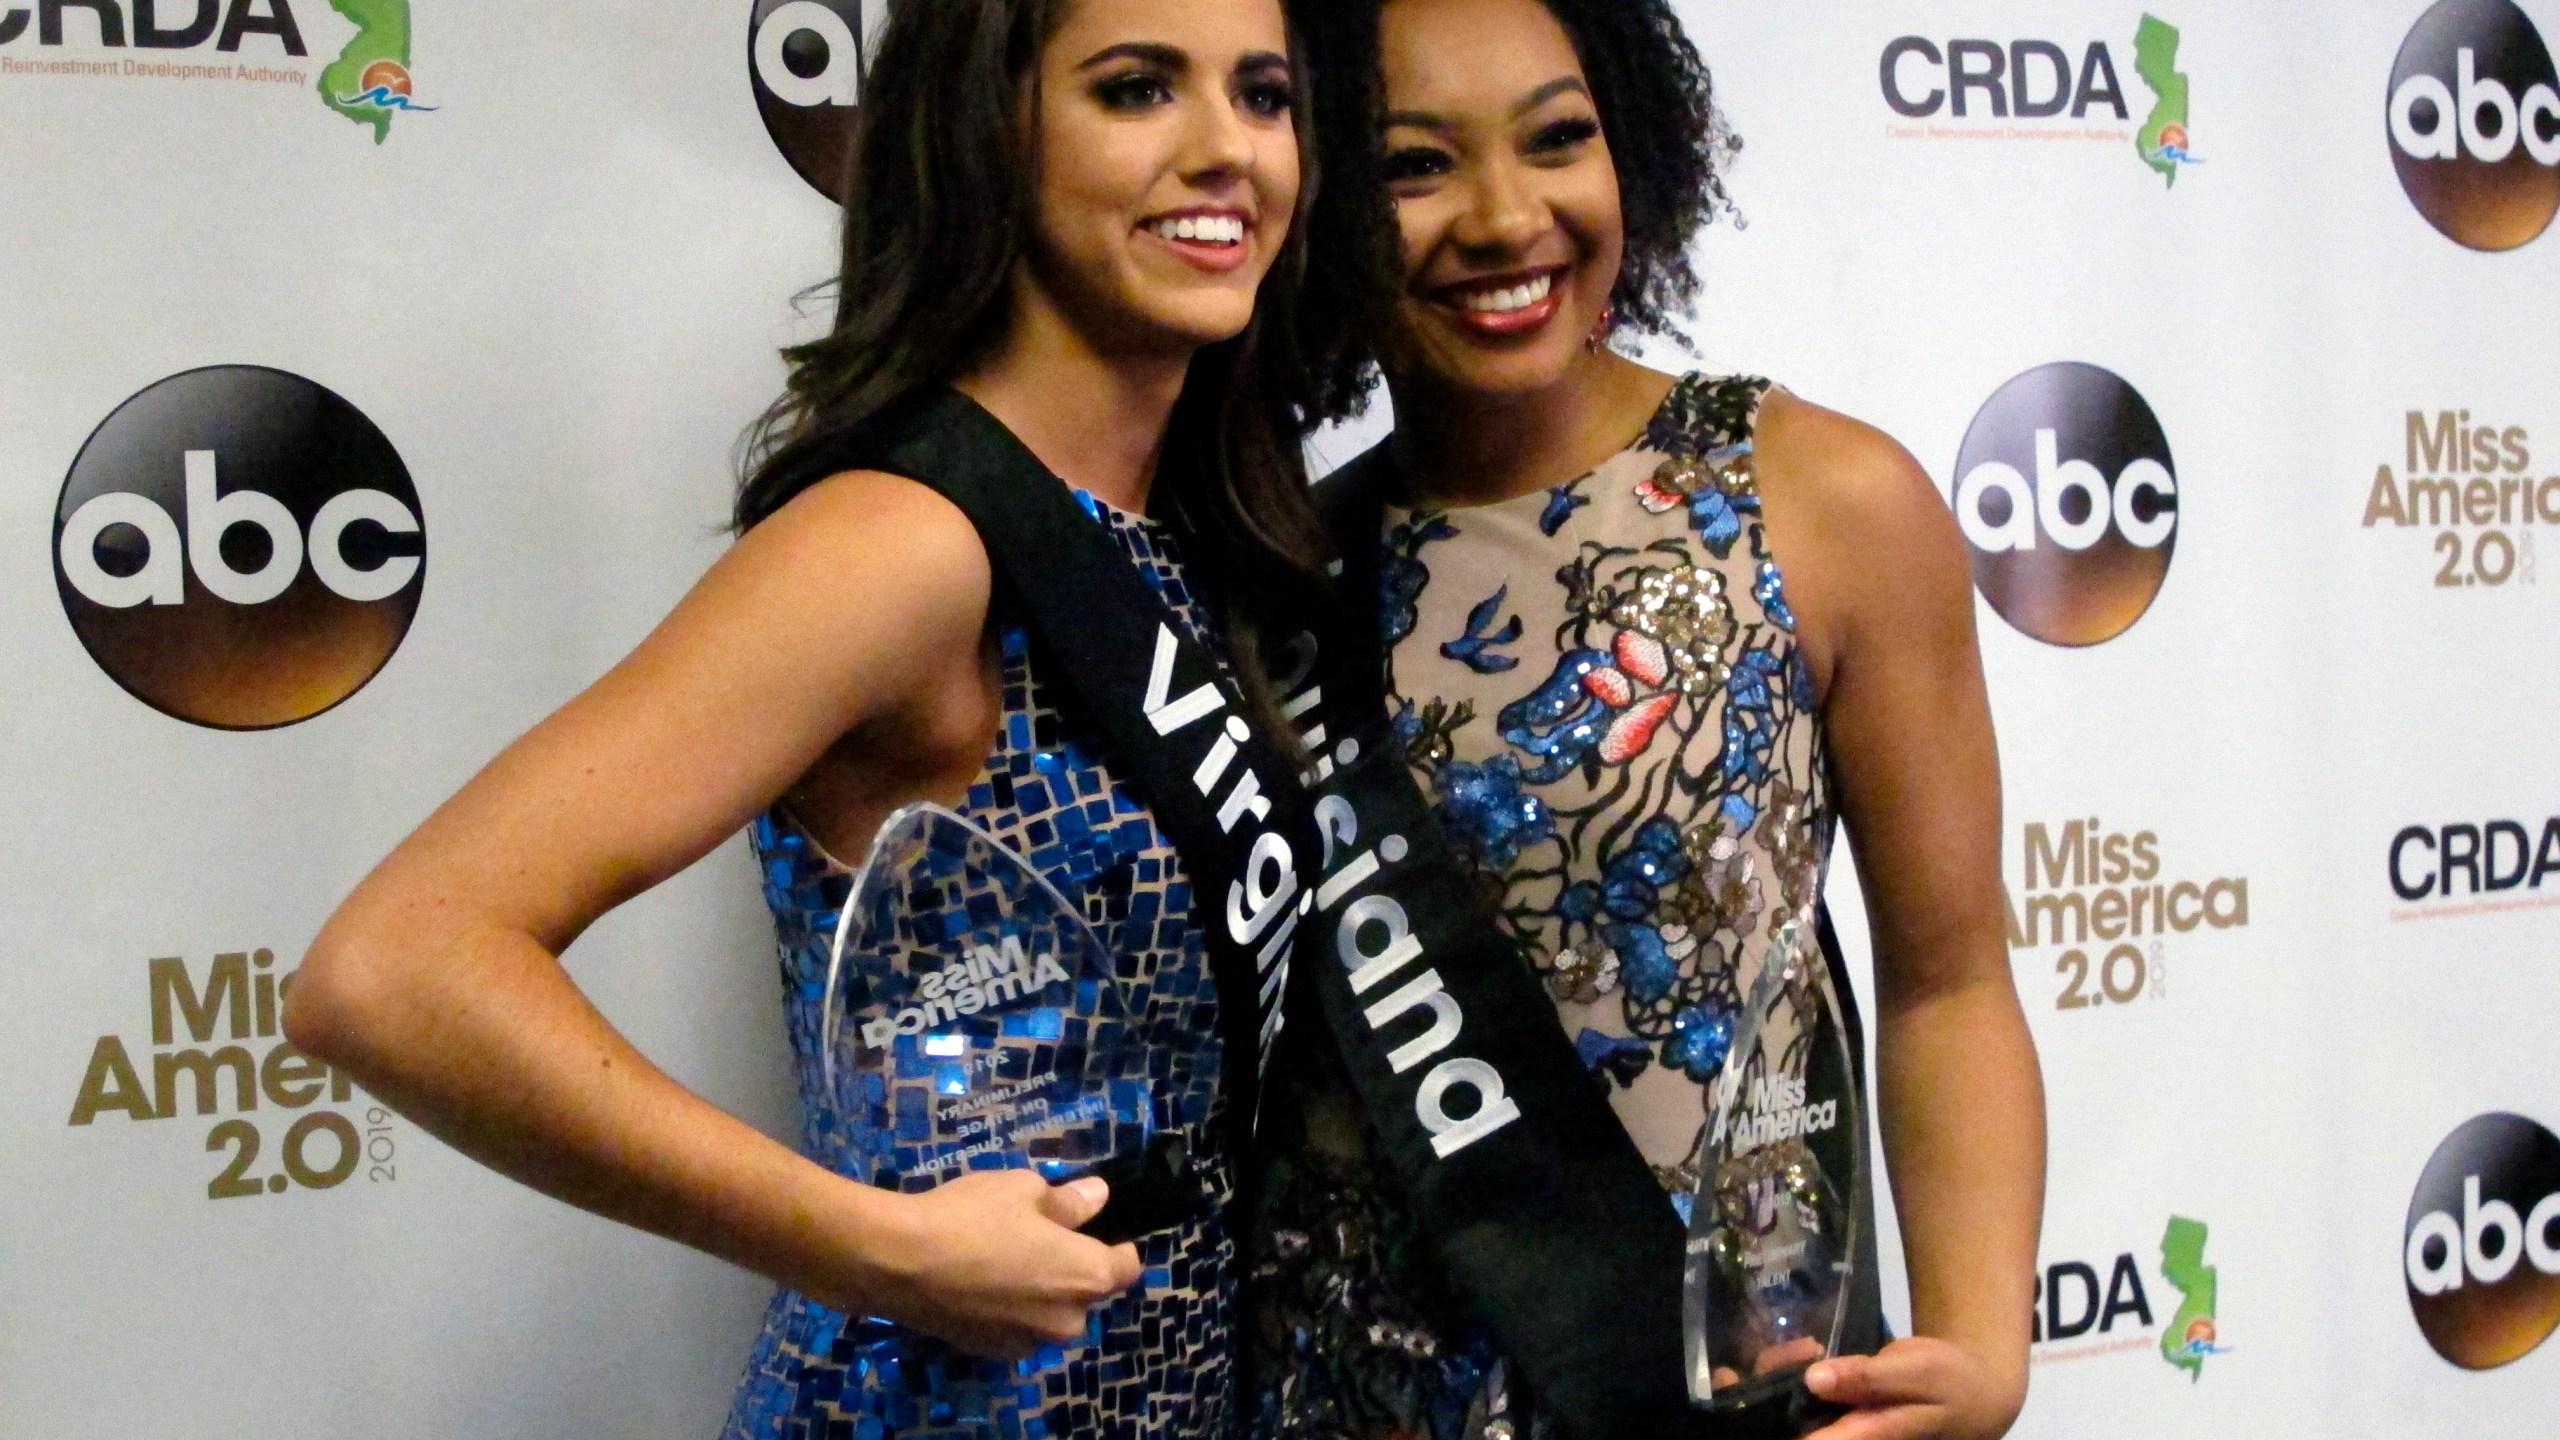 Miss America_1536325303004